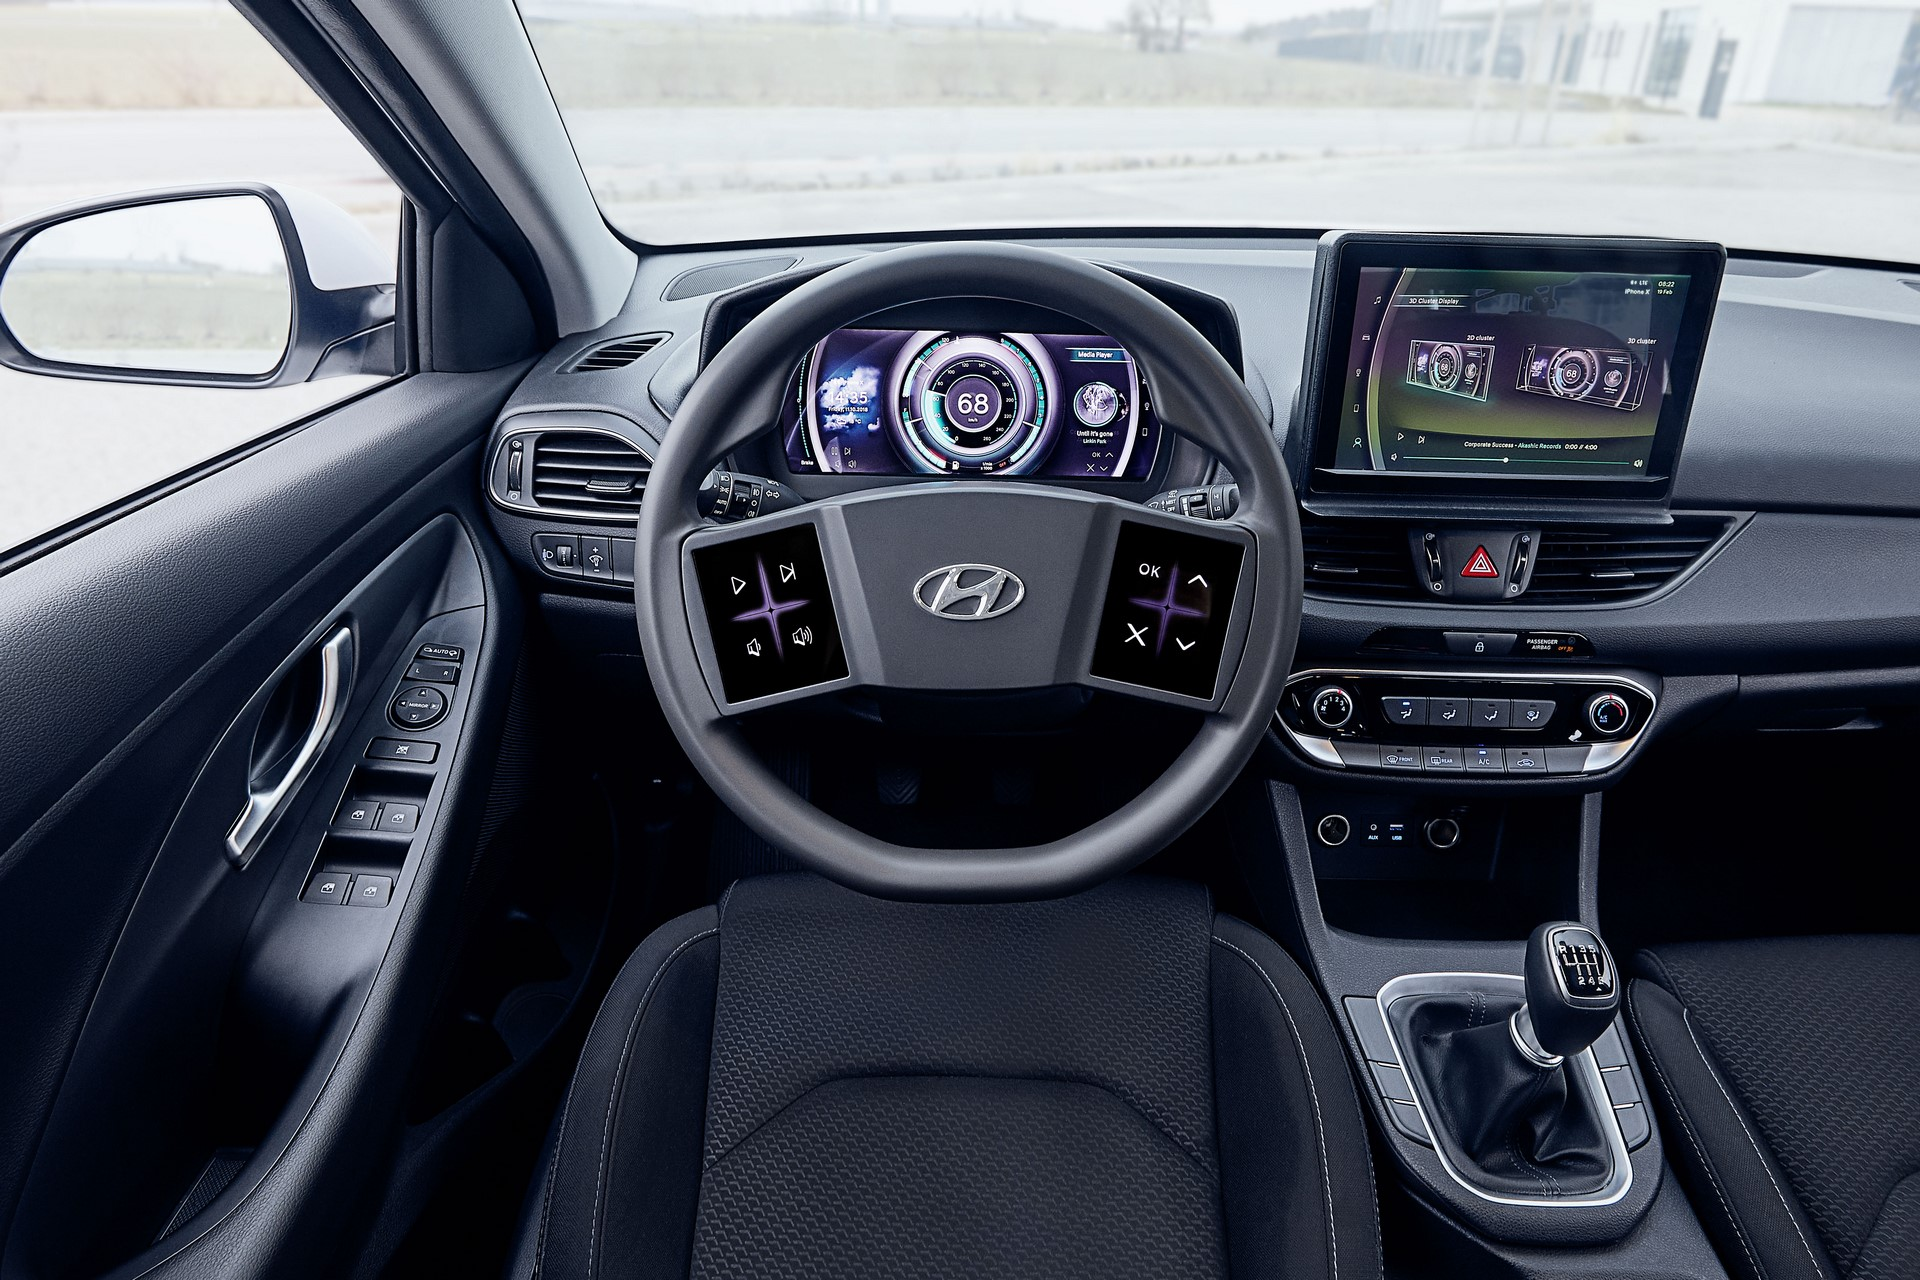 Hyundai-Virtual-cockpit-2019-Hyundai_TechDay_i30_Workshop_238-2